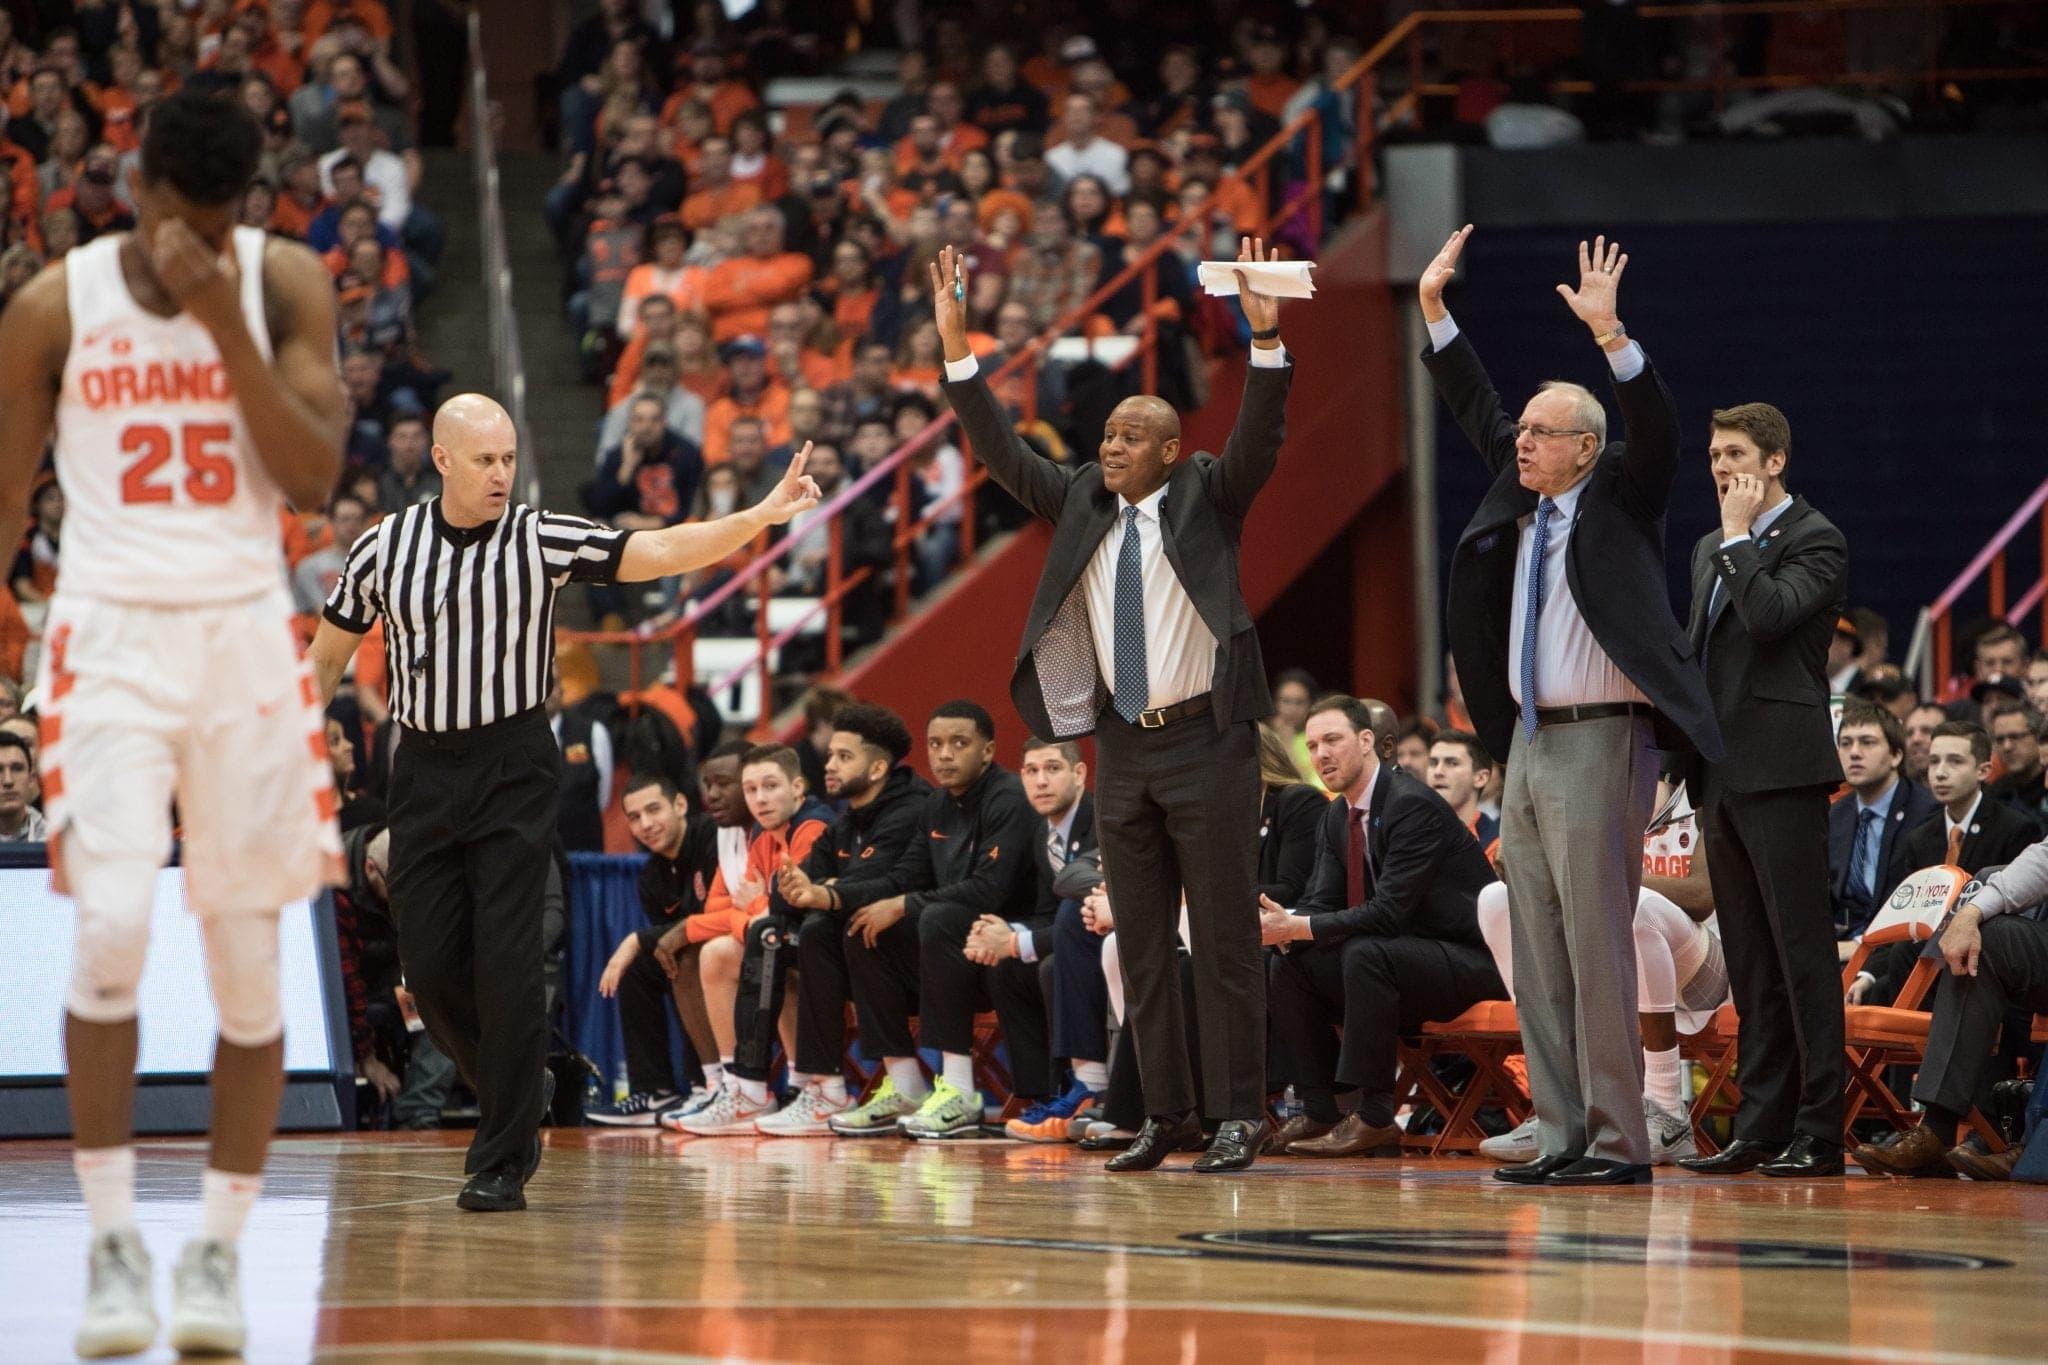 Syracuse vs. Wake Forest men's basketball